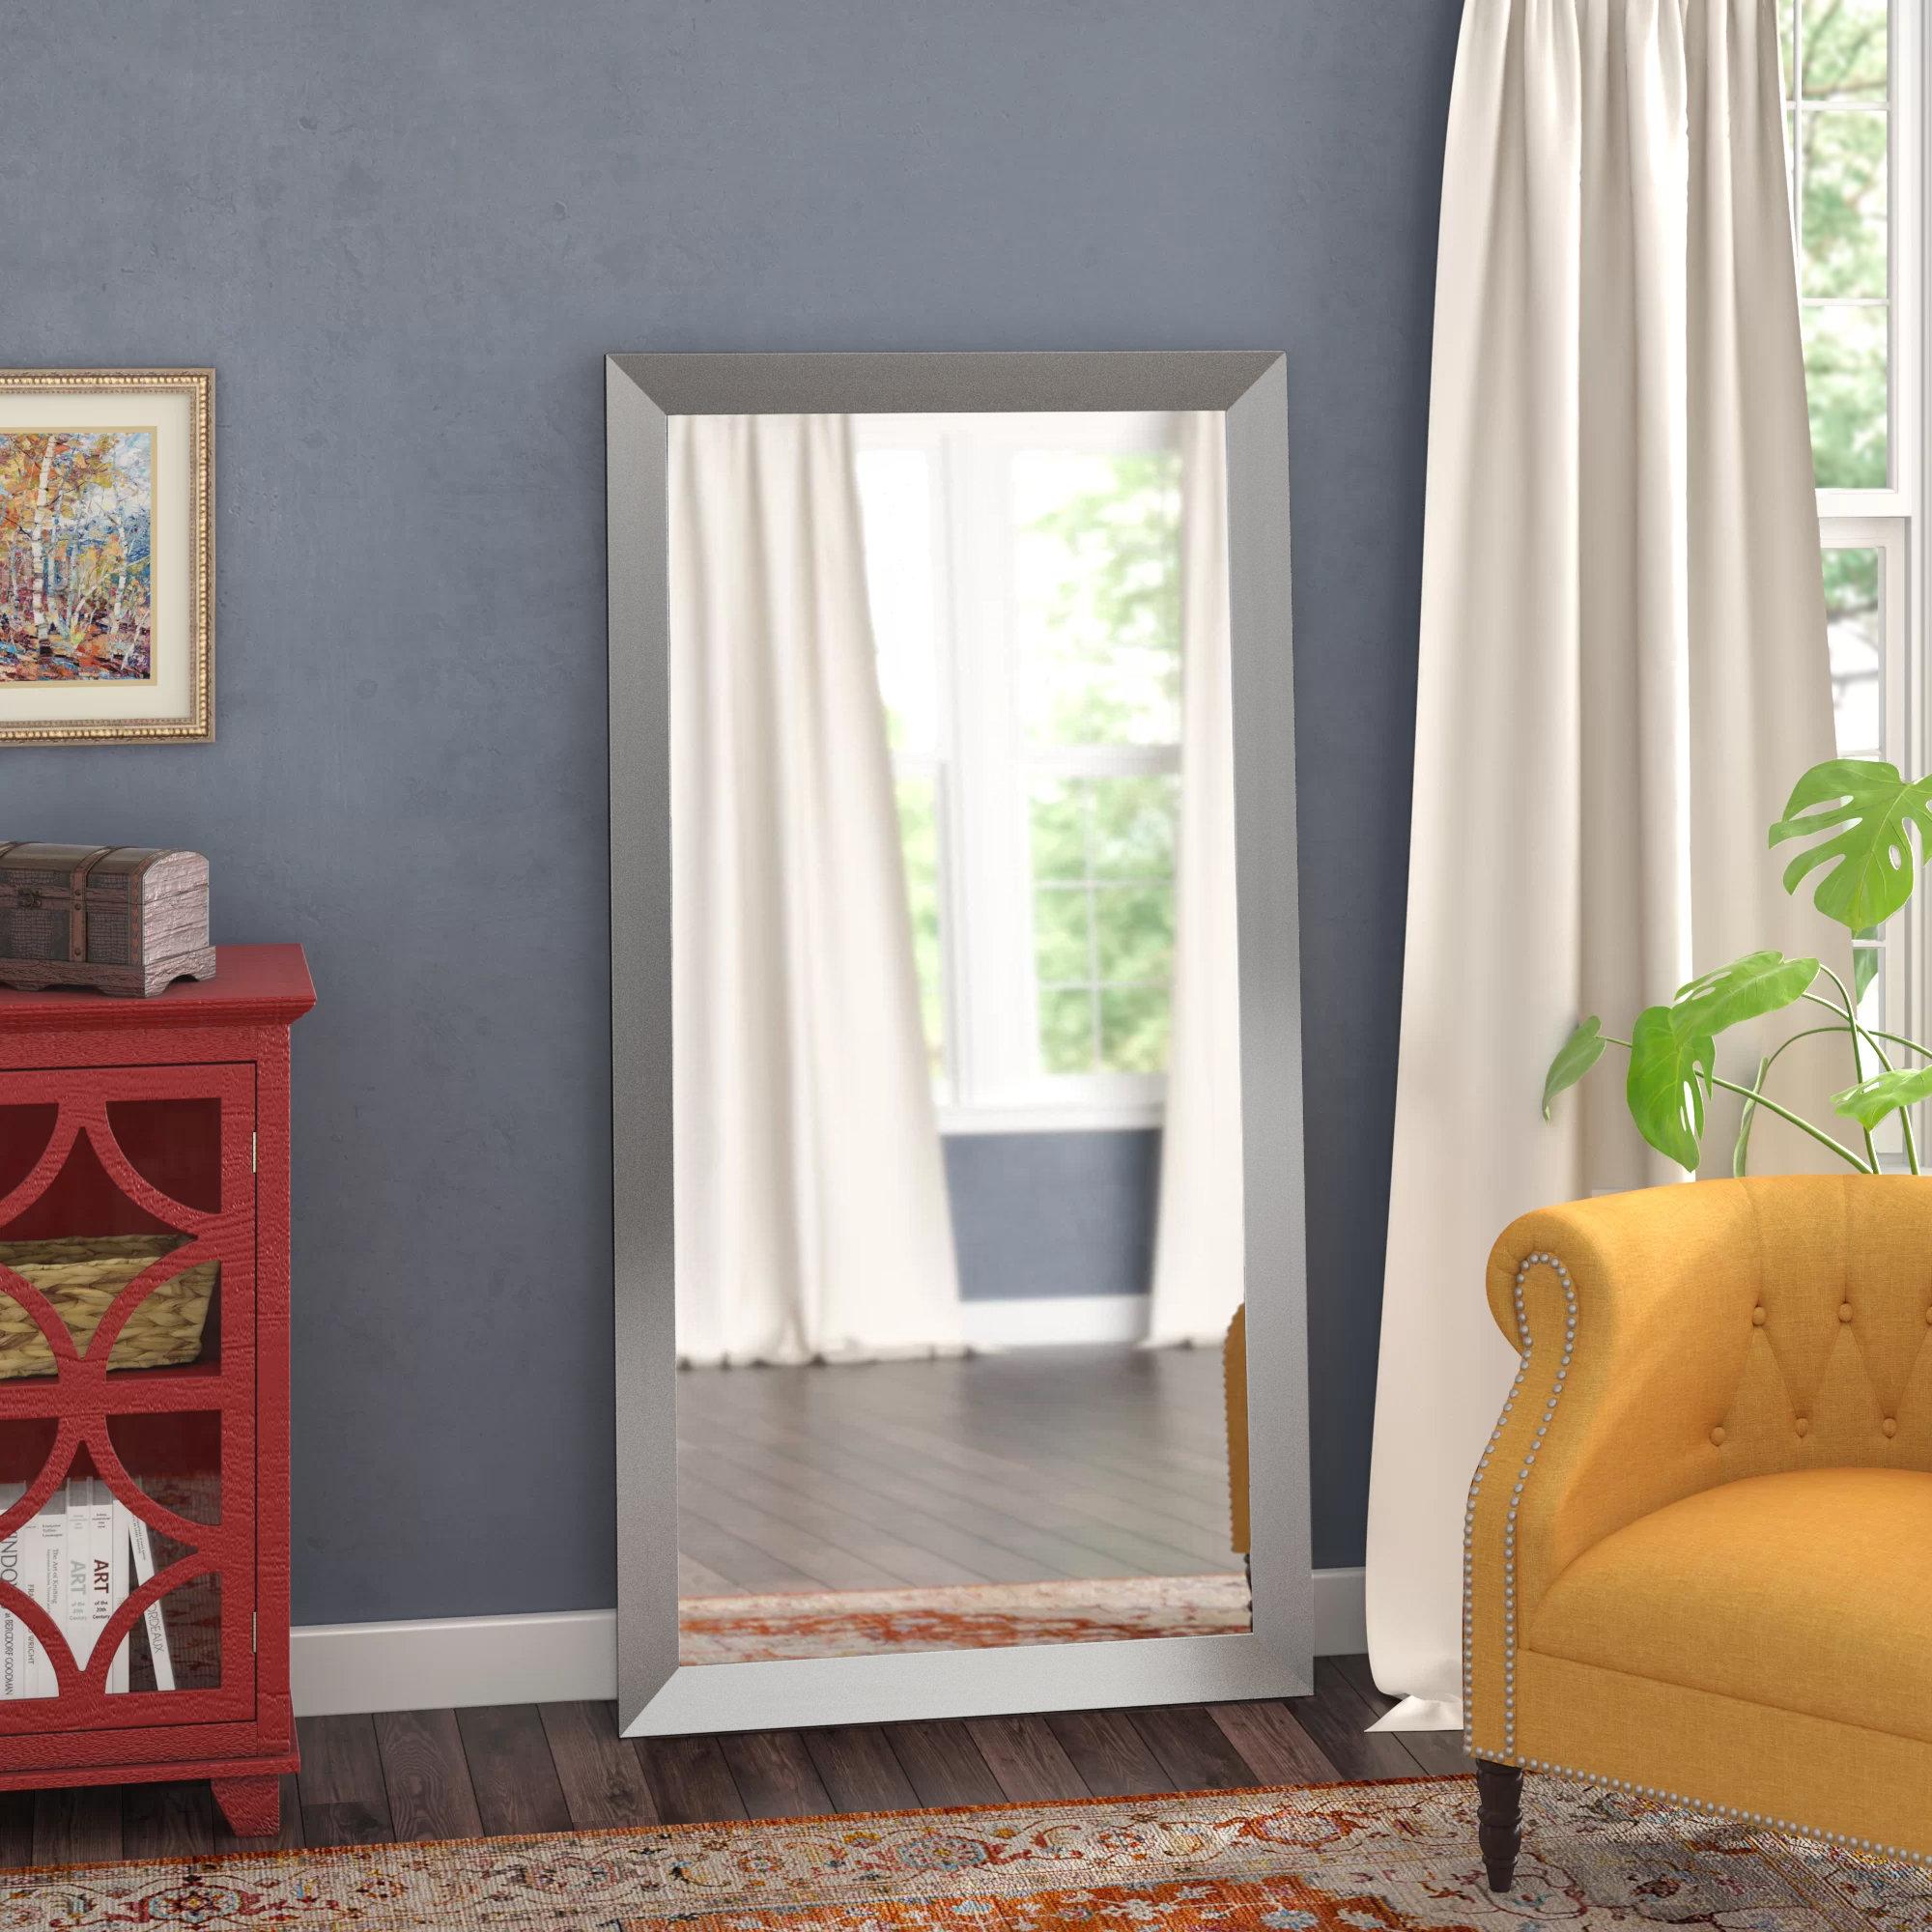 Hogge Full Length Mirror Throughout Hogge Modern Brushed Nickel Large Frame Wall Mirrors (Image 8 of 20)